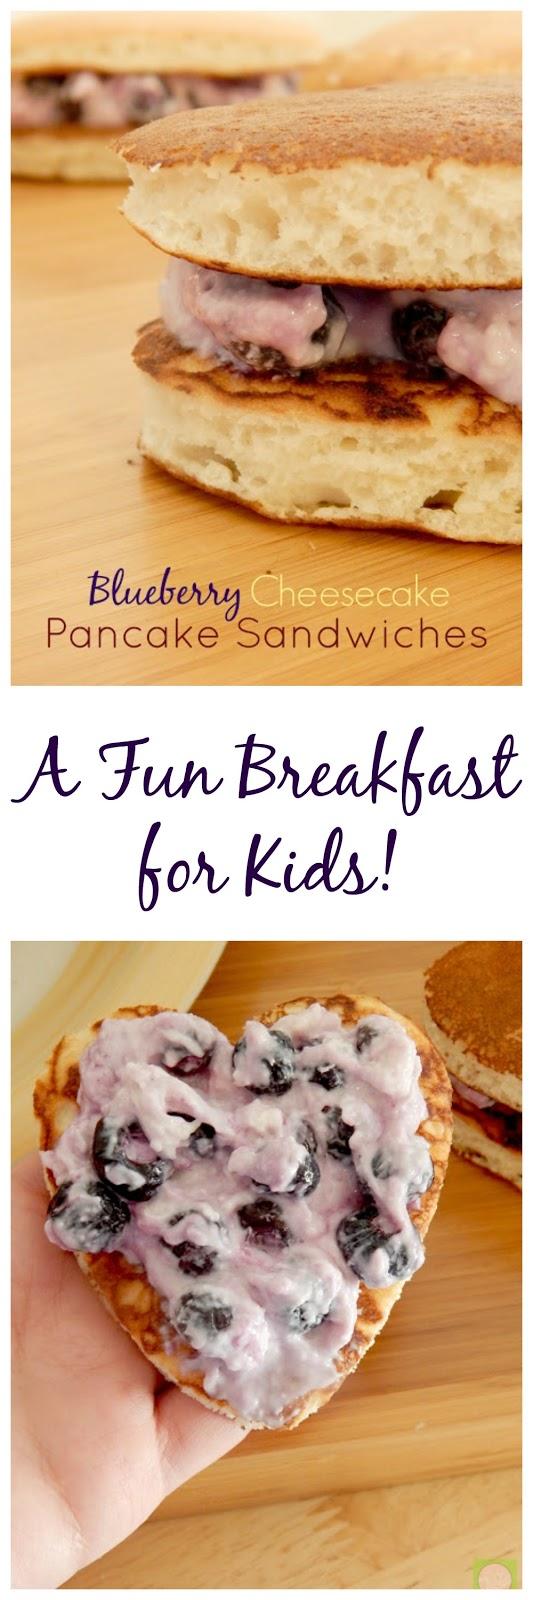 blueberry cheesecake pancake sandwiches (sweetandsavoryfood.com)